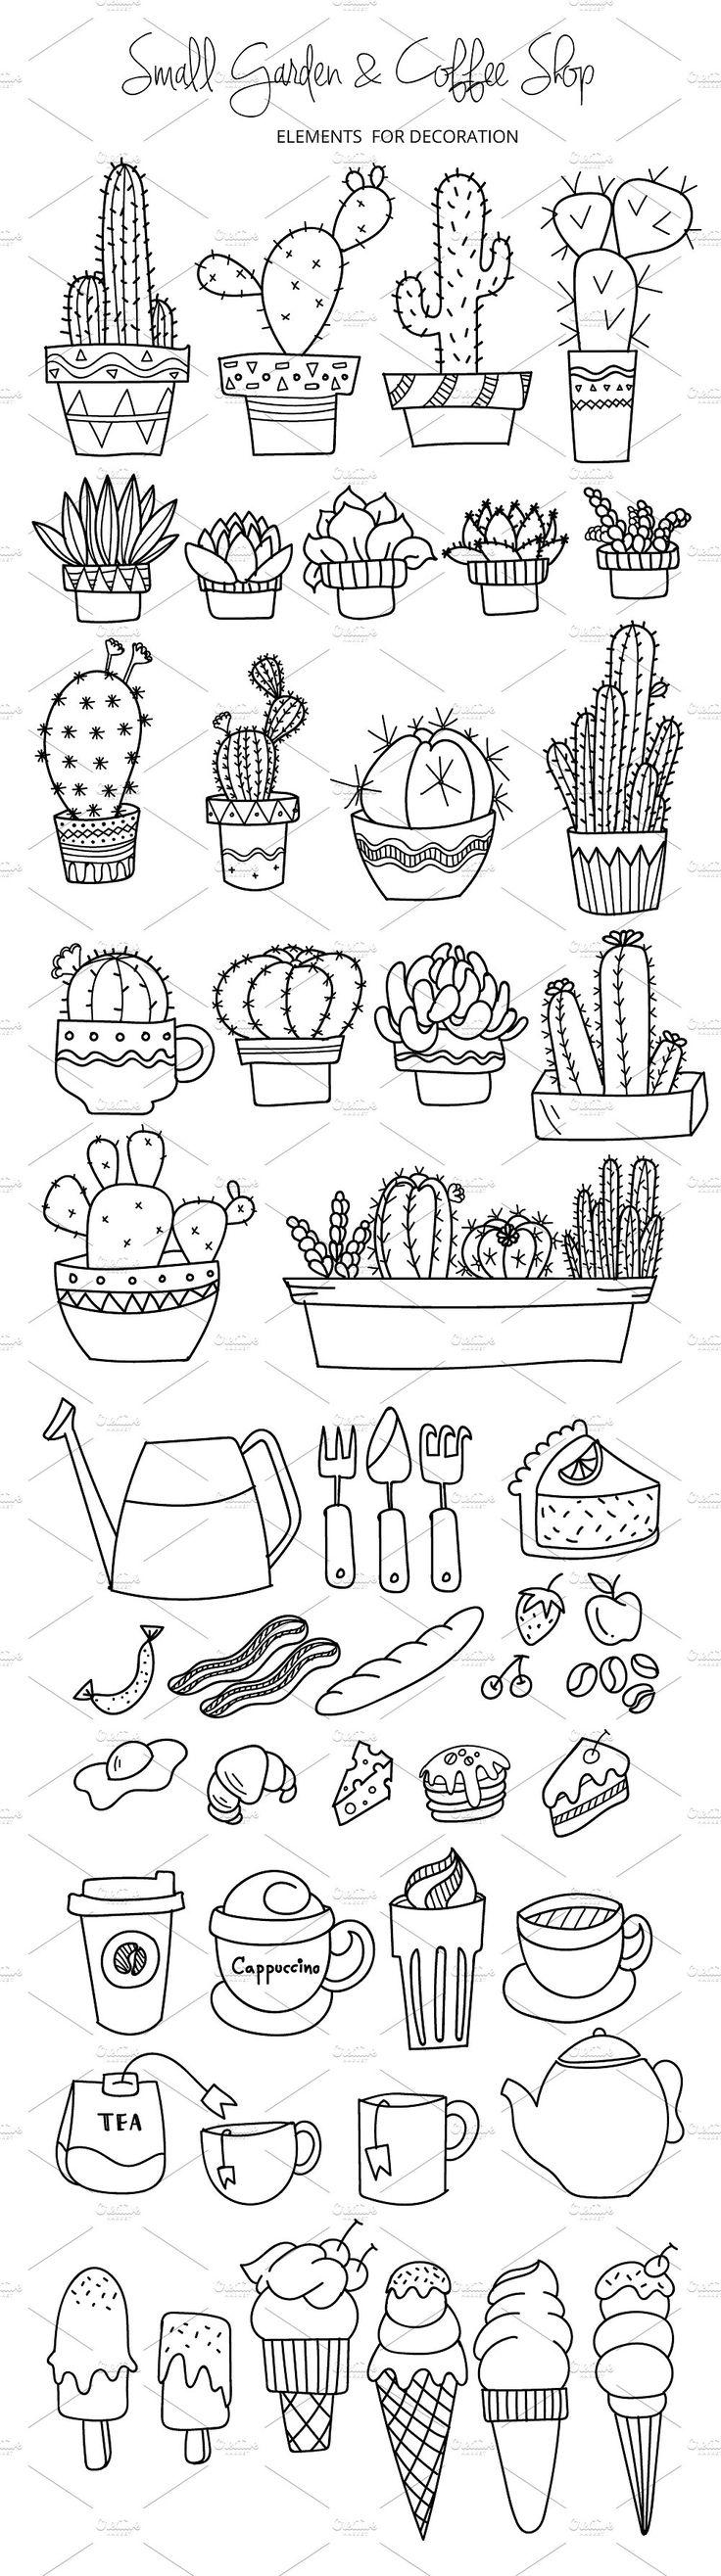 Small Garden & Coffee Shop - Illustrations - 1